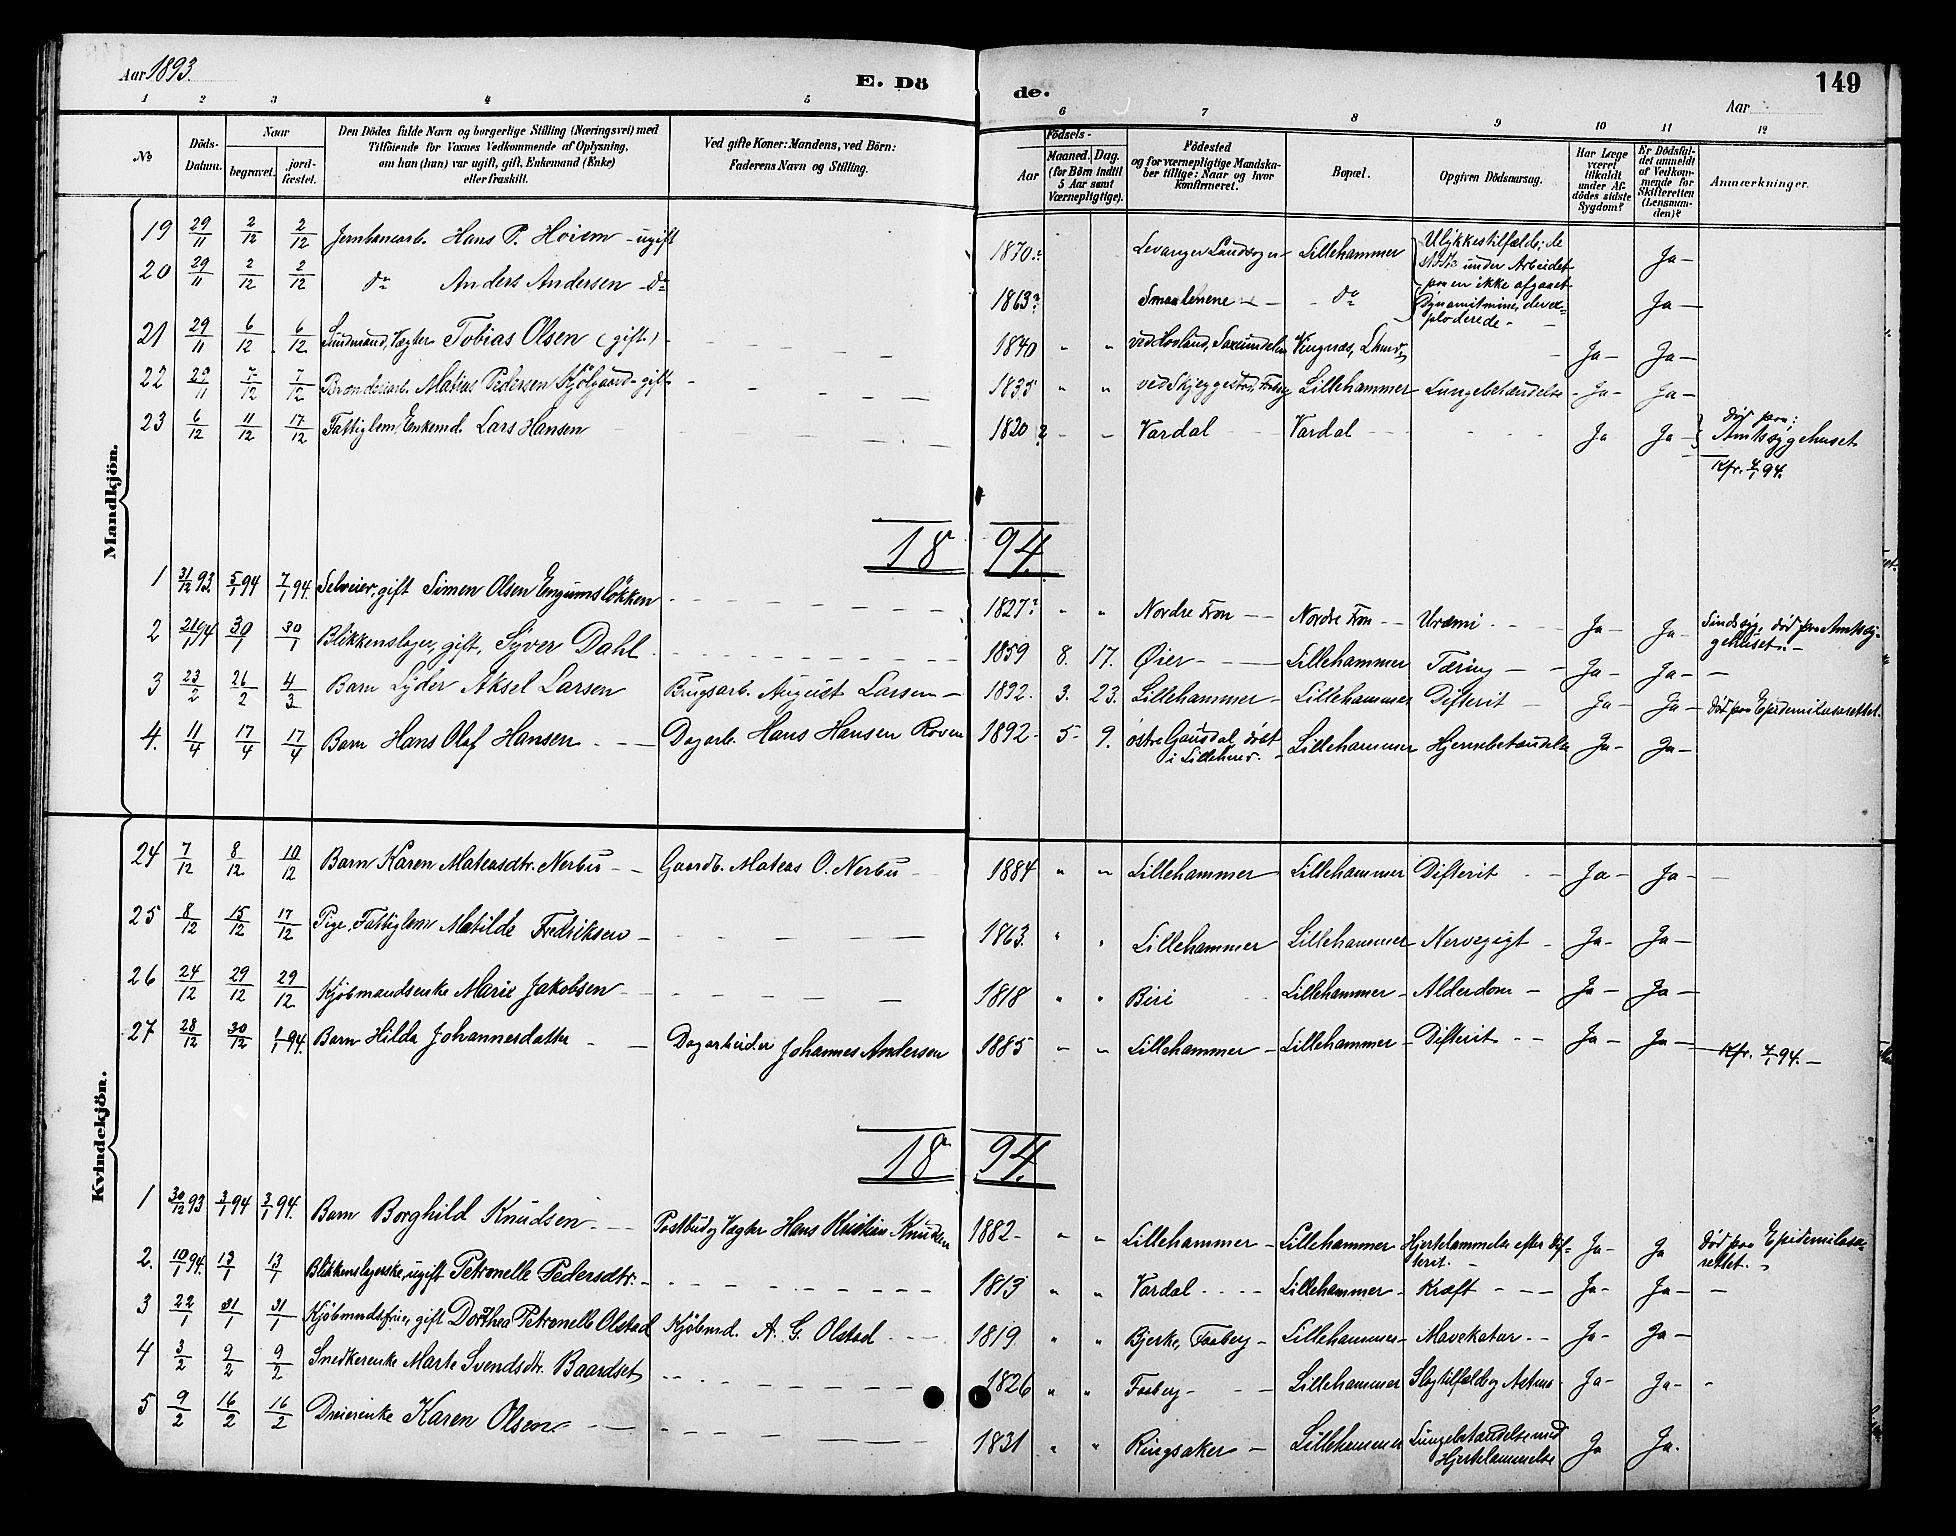 SAH, Fåberg prestekontor, Klokkerbok nr. 8, 1891-1900, s. 149